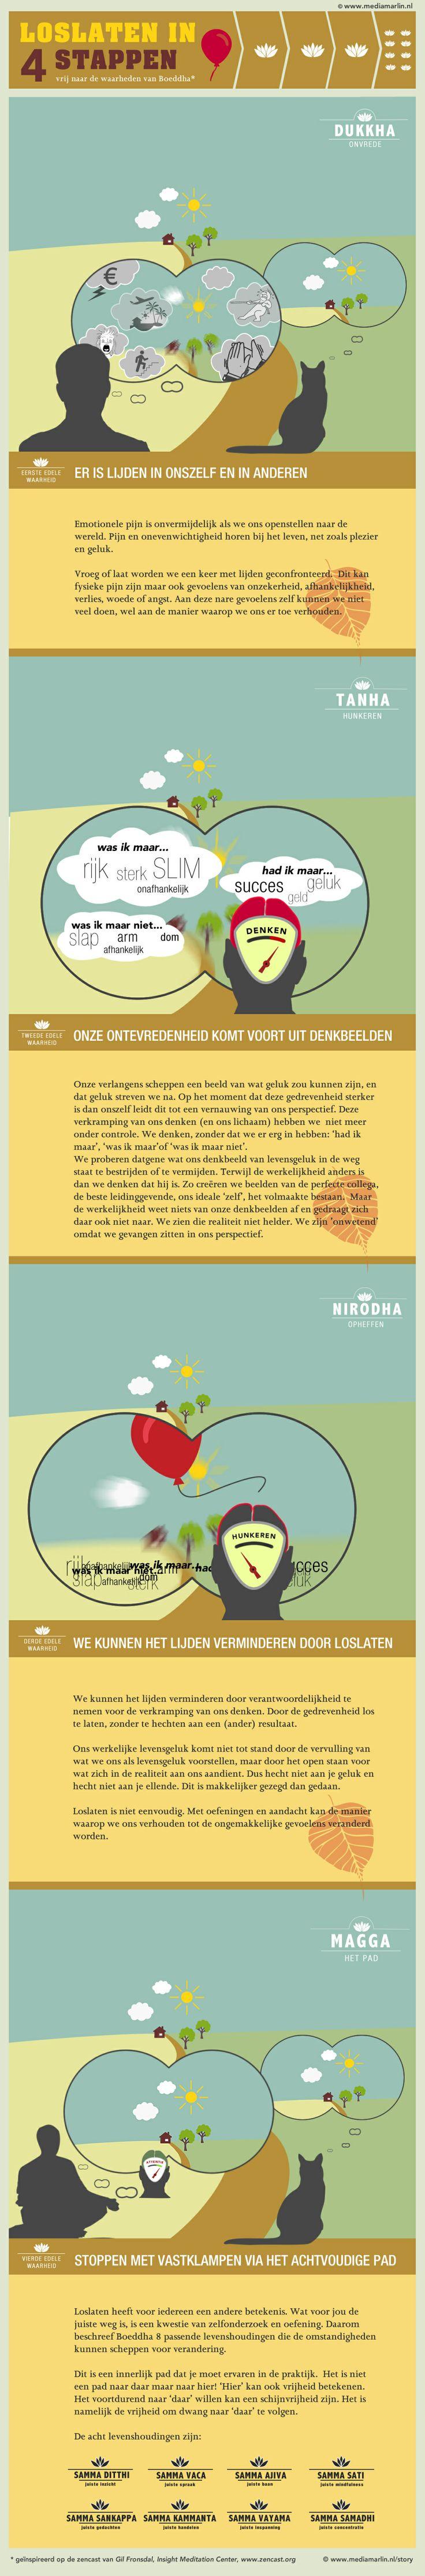 Dukkha, Tanha, Nirodha, Magga, Four Noble truths, buddhism, boeddhisme, Mindfulness, Zie ook: www.mediamarlin.nl/story